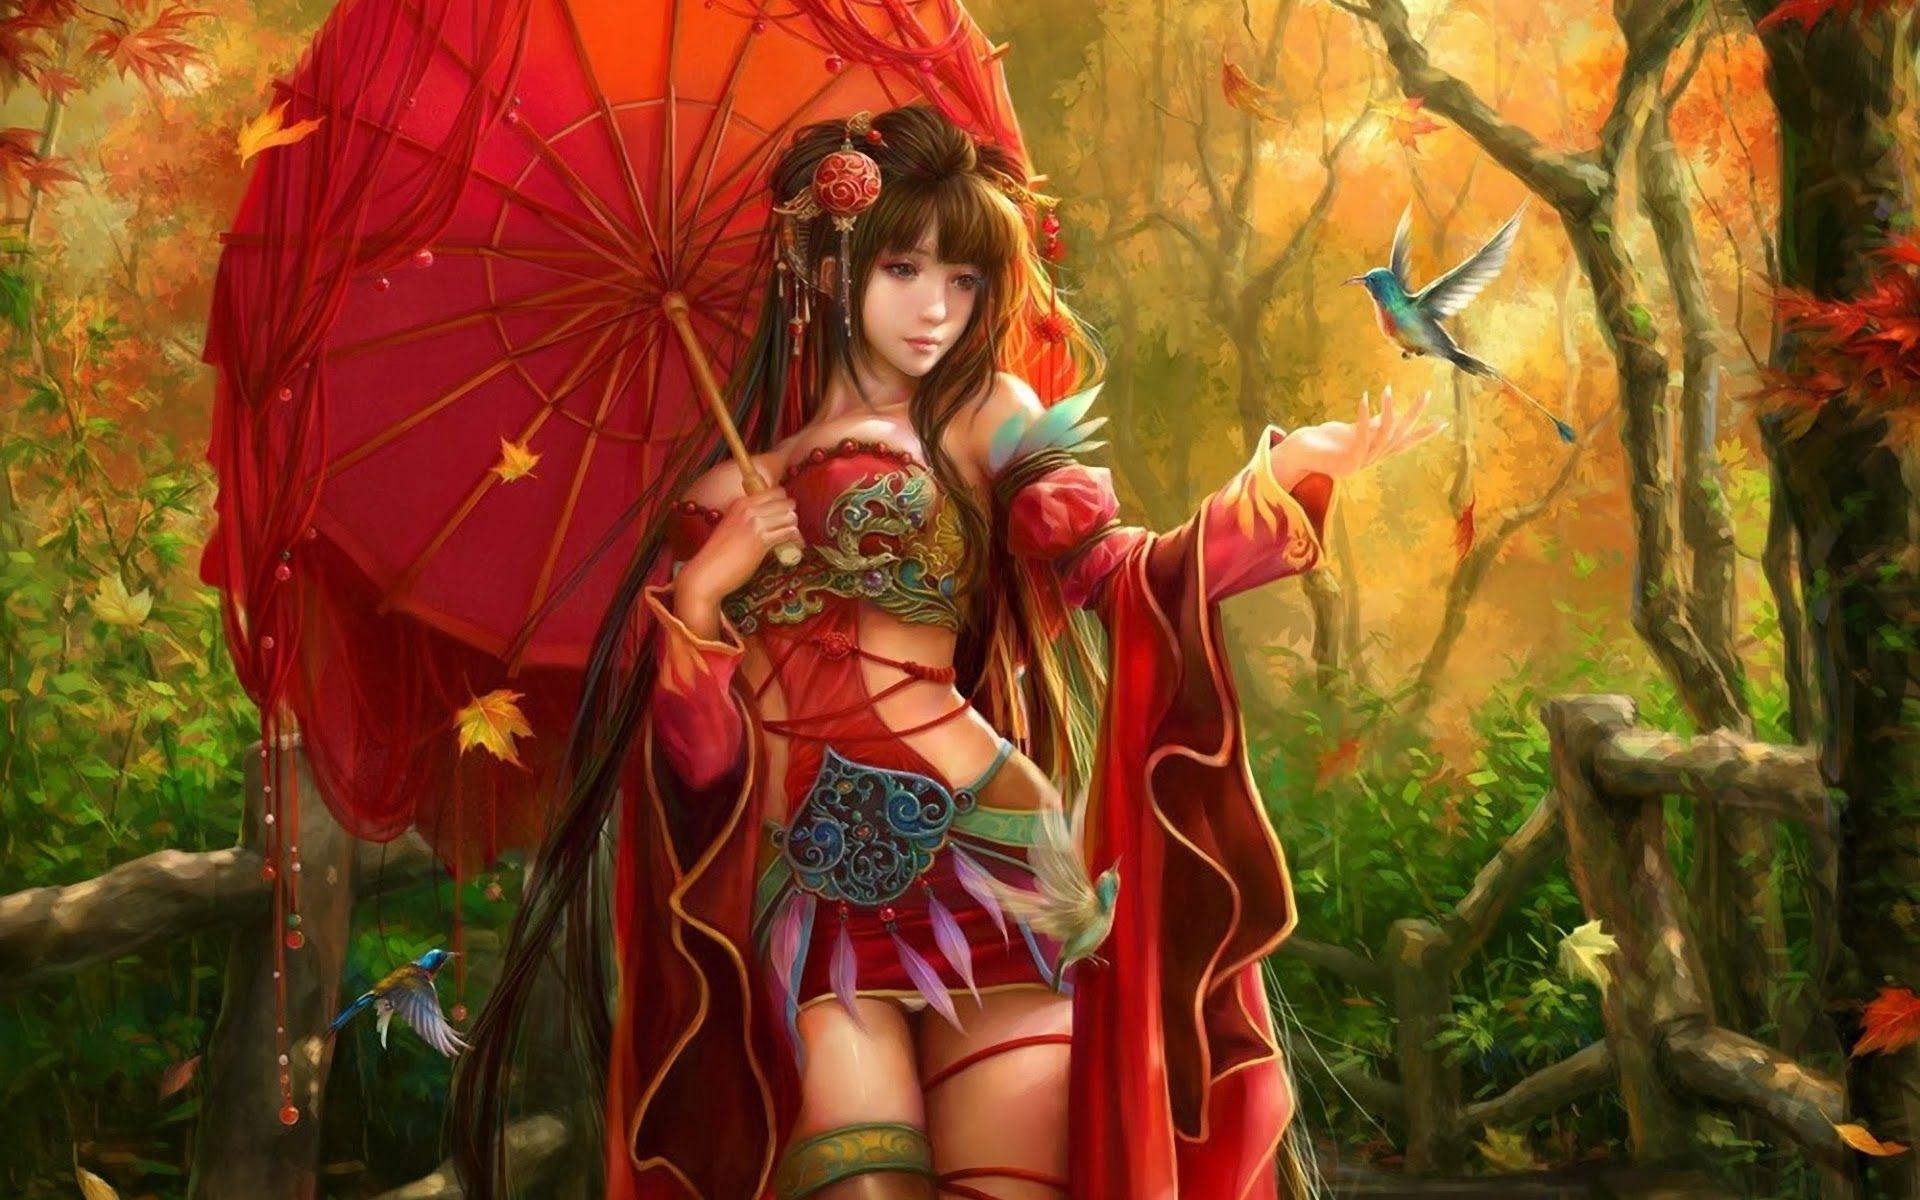 Girls With Umbrella Hd Wallpapers Hd Wallpapers Inn Trends for art wallpaper hd for girls